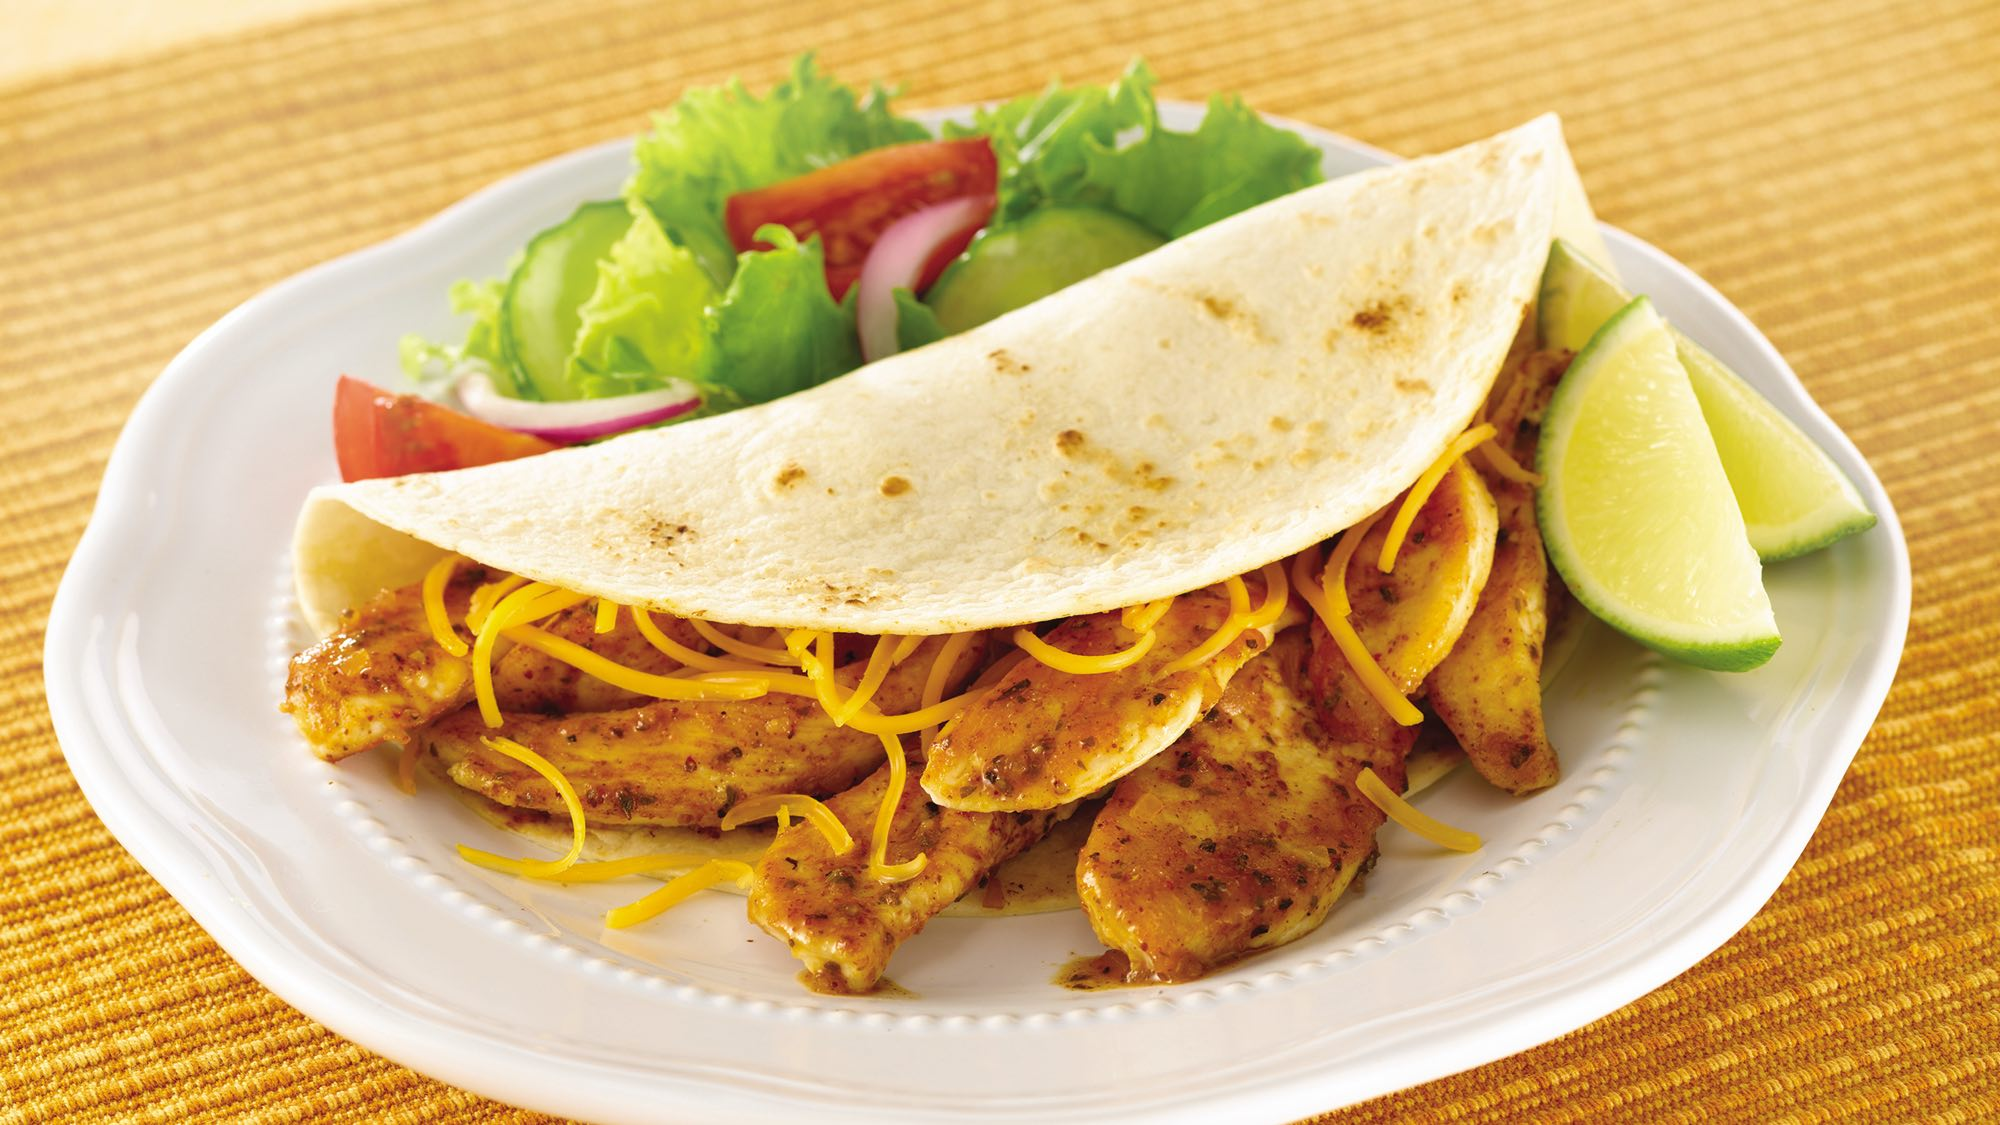 McCormick Chicken Fajitas Recipe